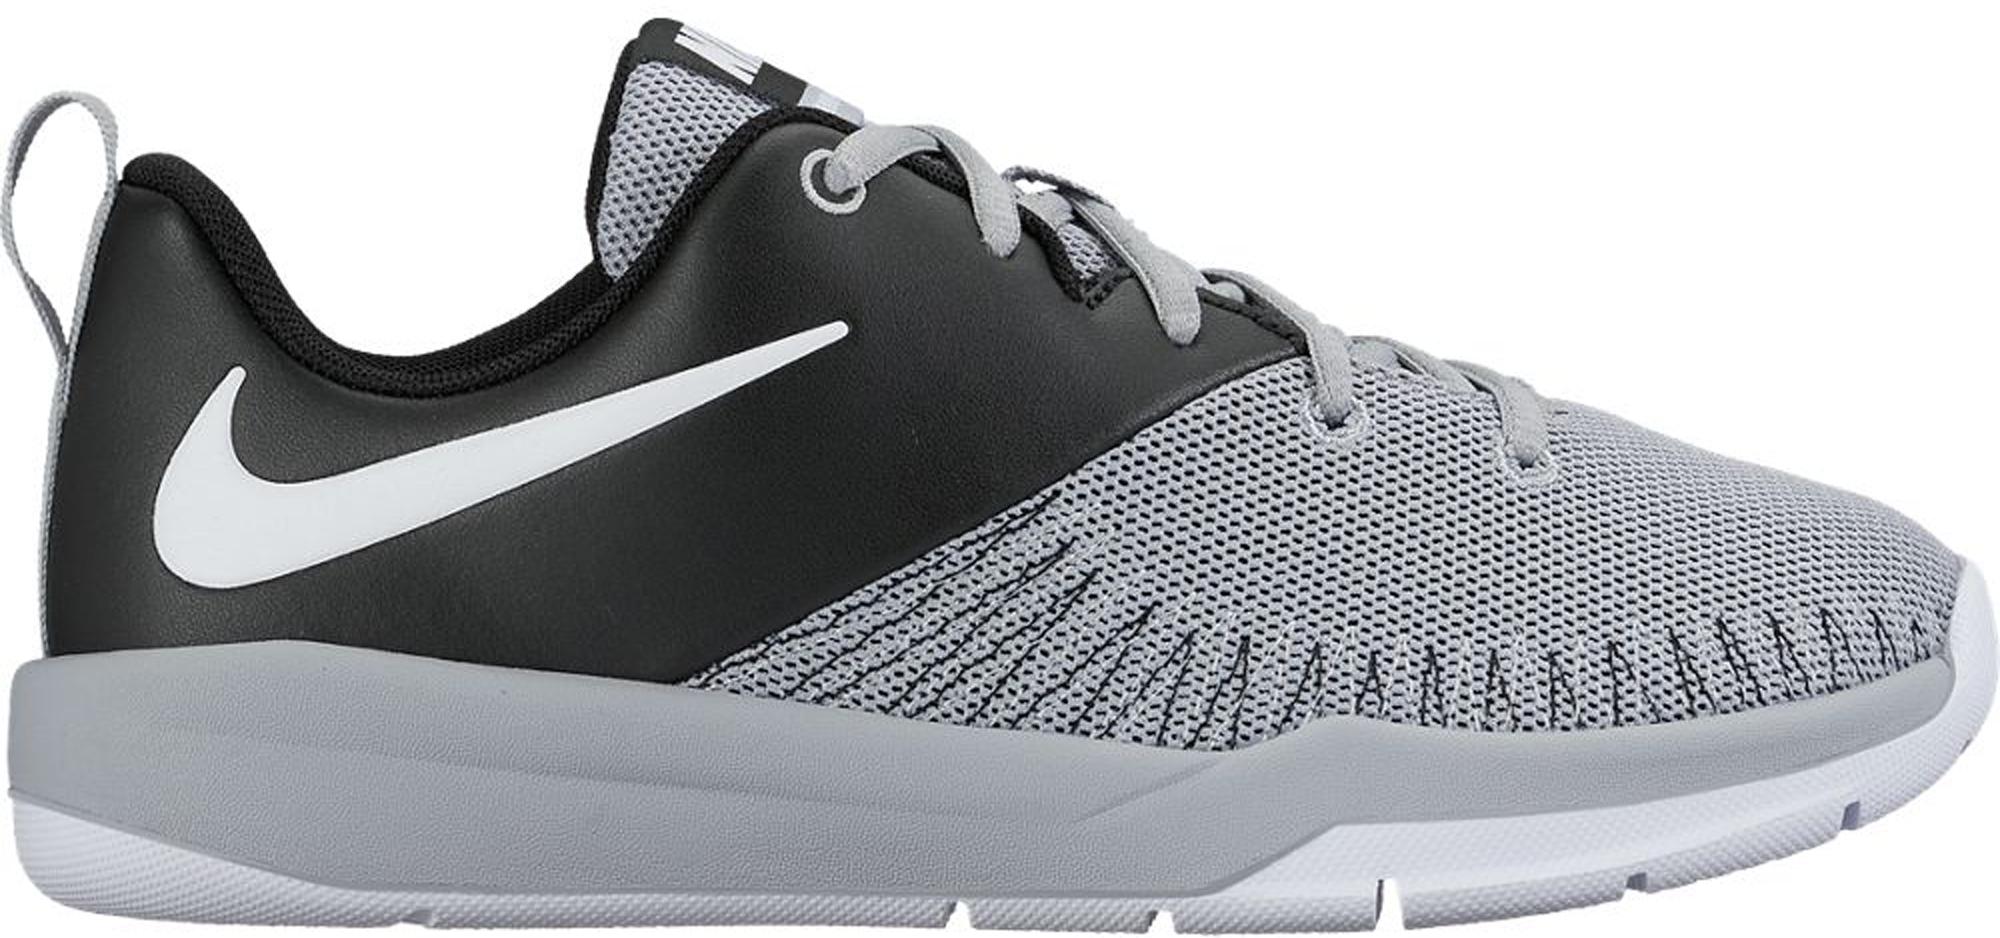 Nike Team Hustle D 7 Low Black Wolf